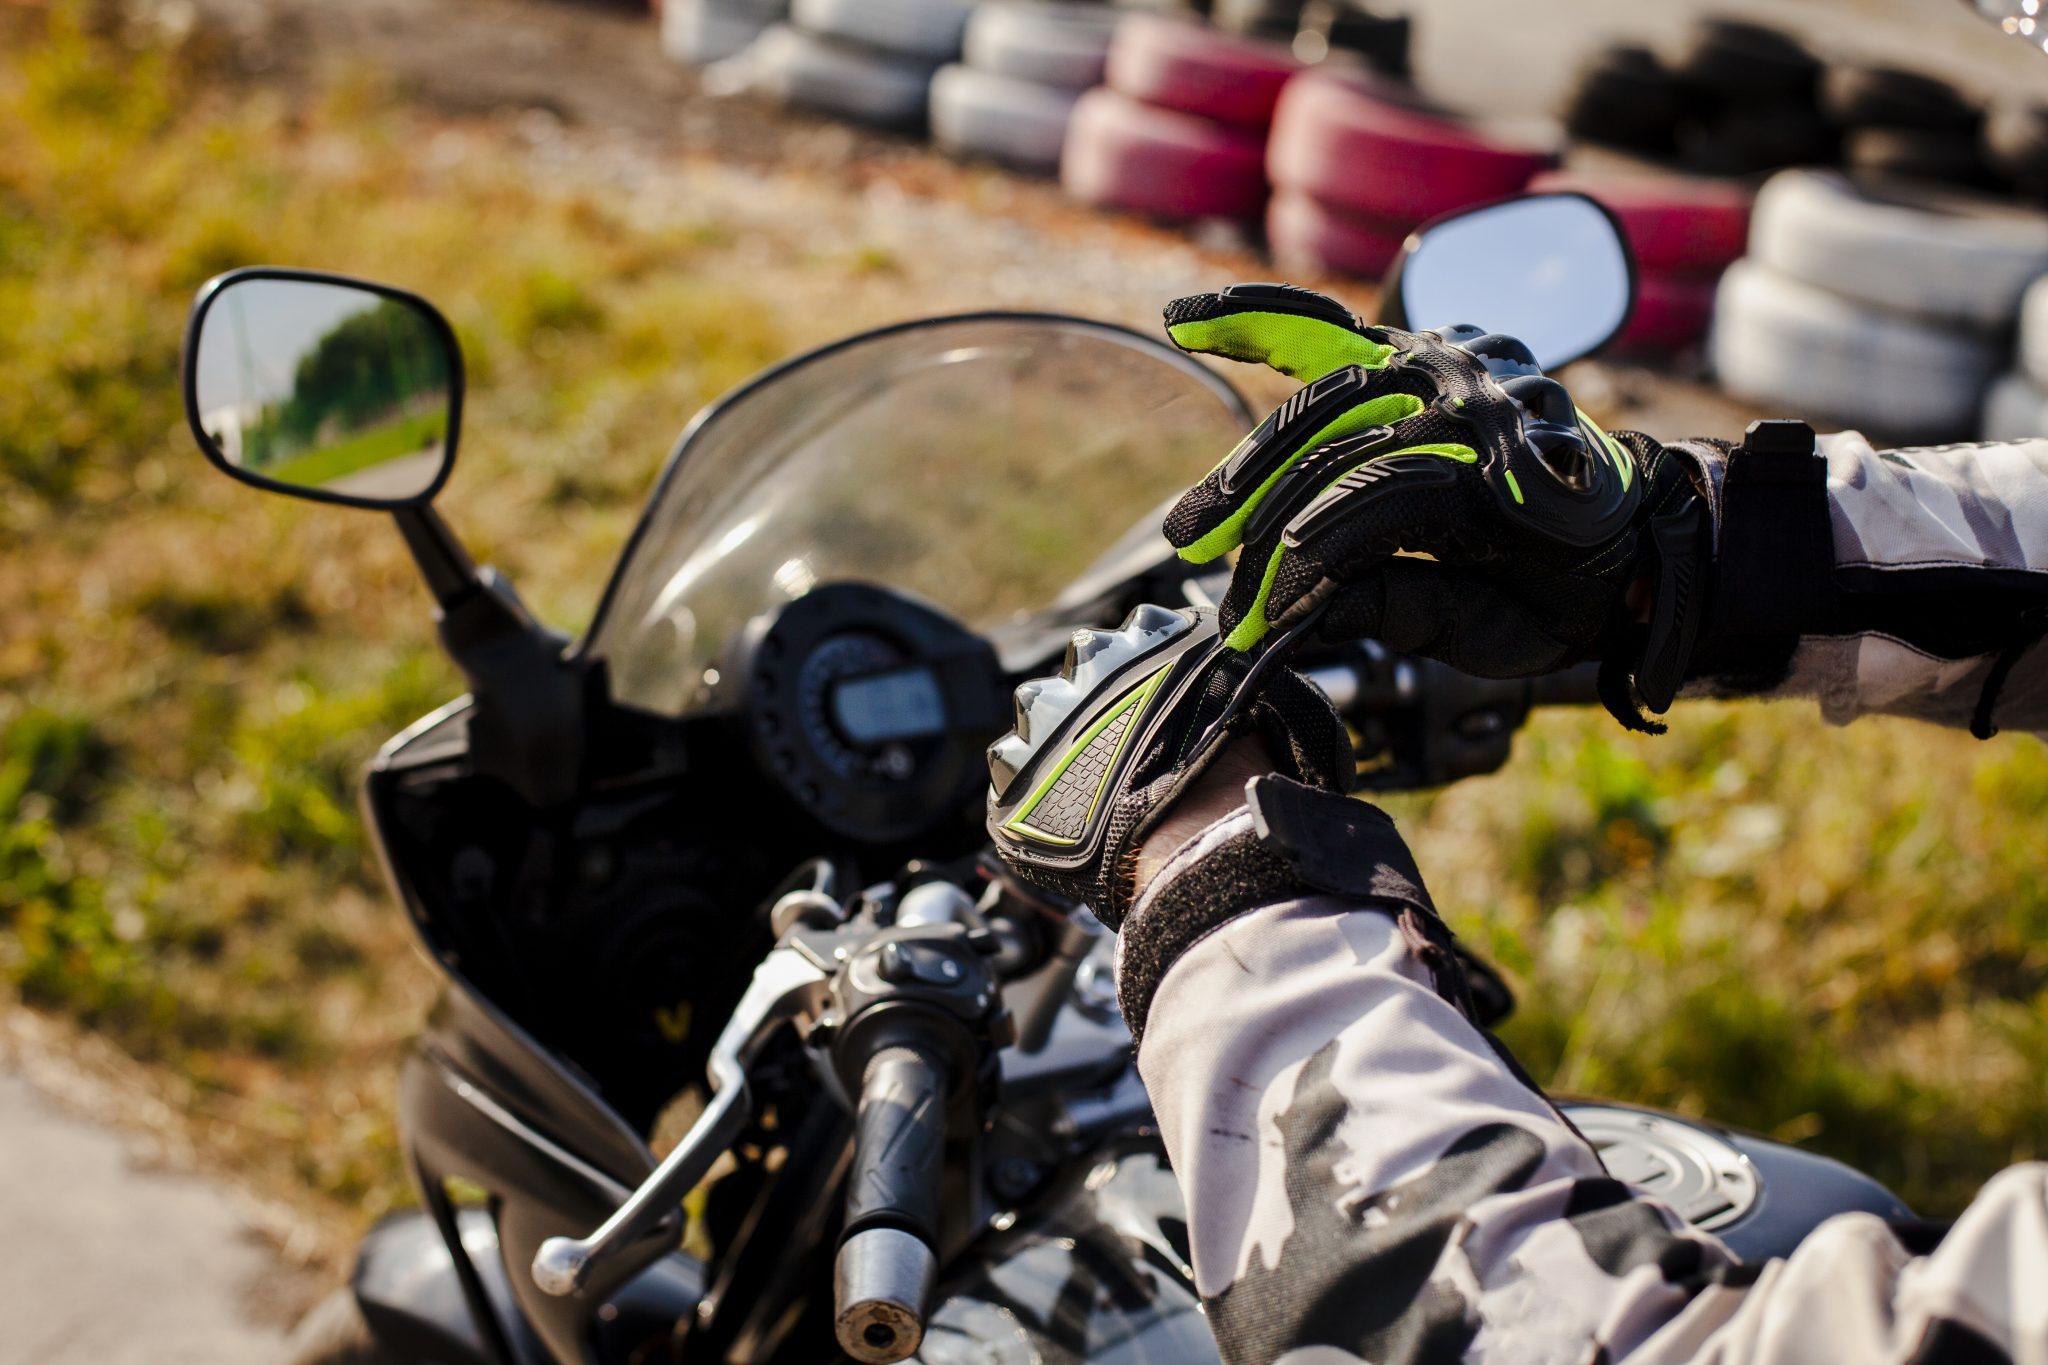 Kevlar motorcycle gloves